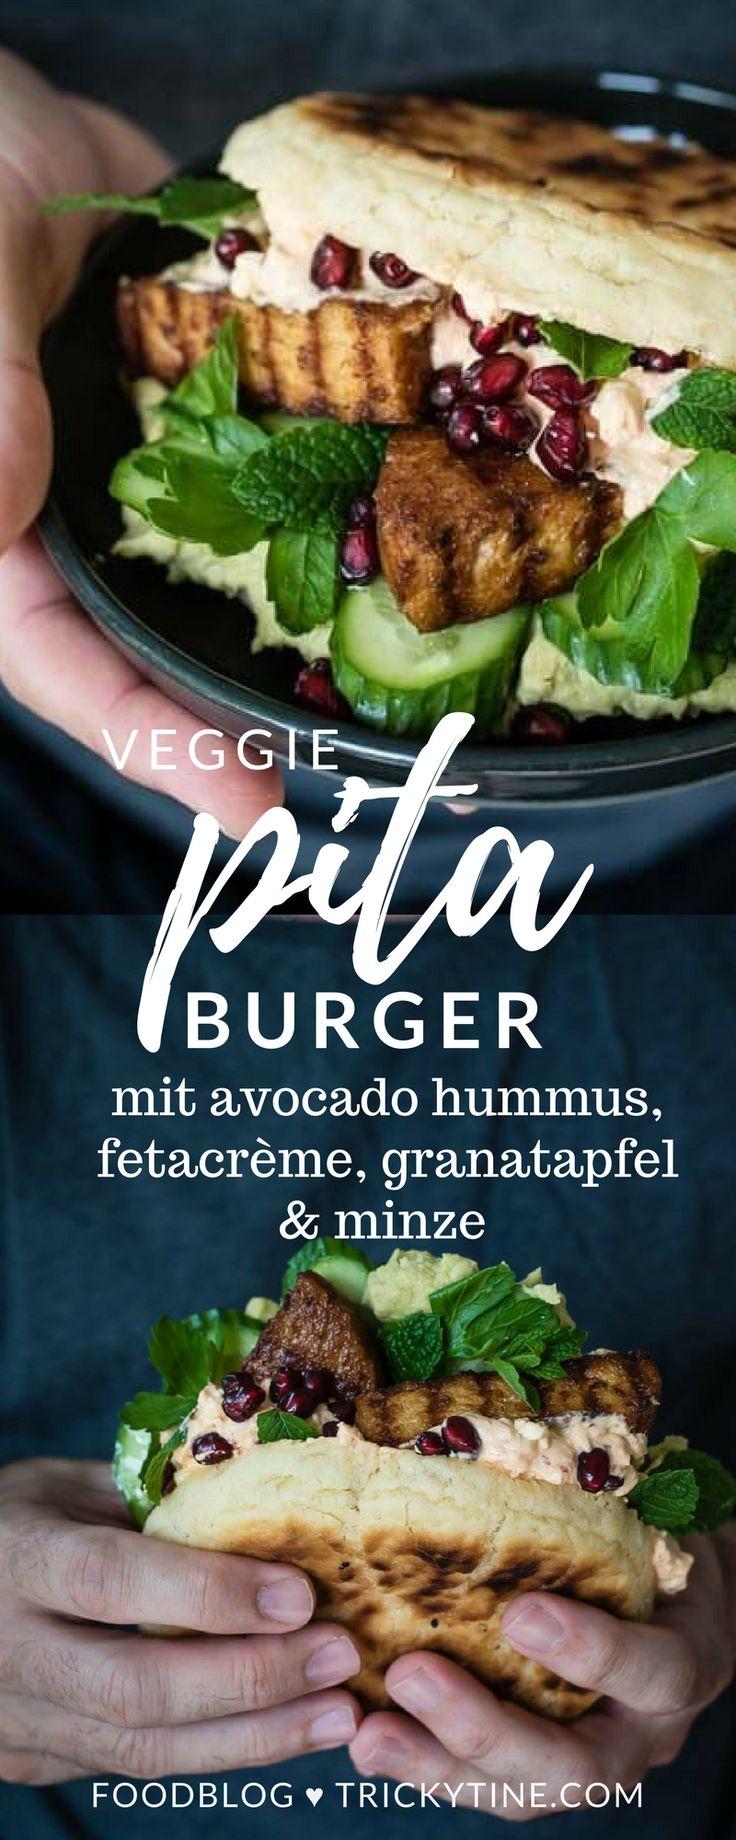 veggie pitta burger mit avocado hummus, fetacrème, granatapfel & minze ♥ trickytine.com